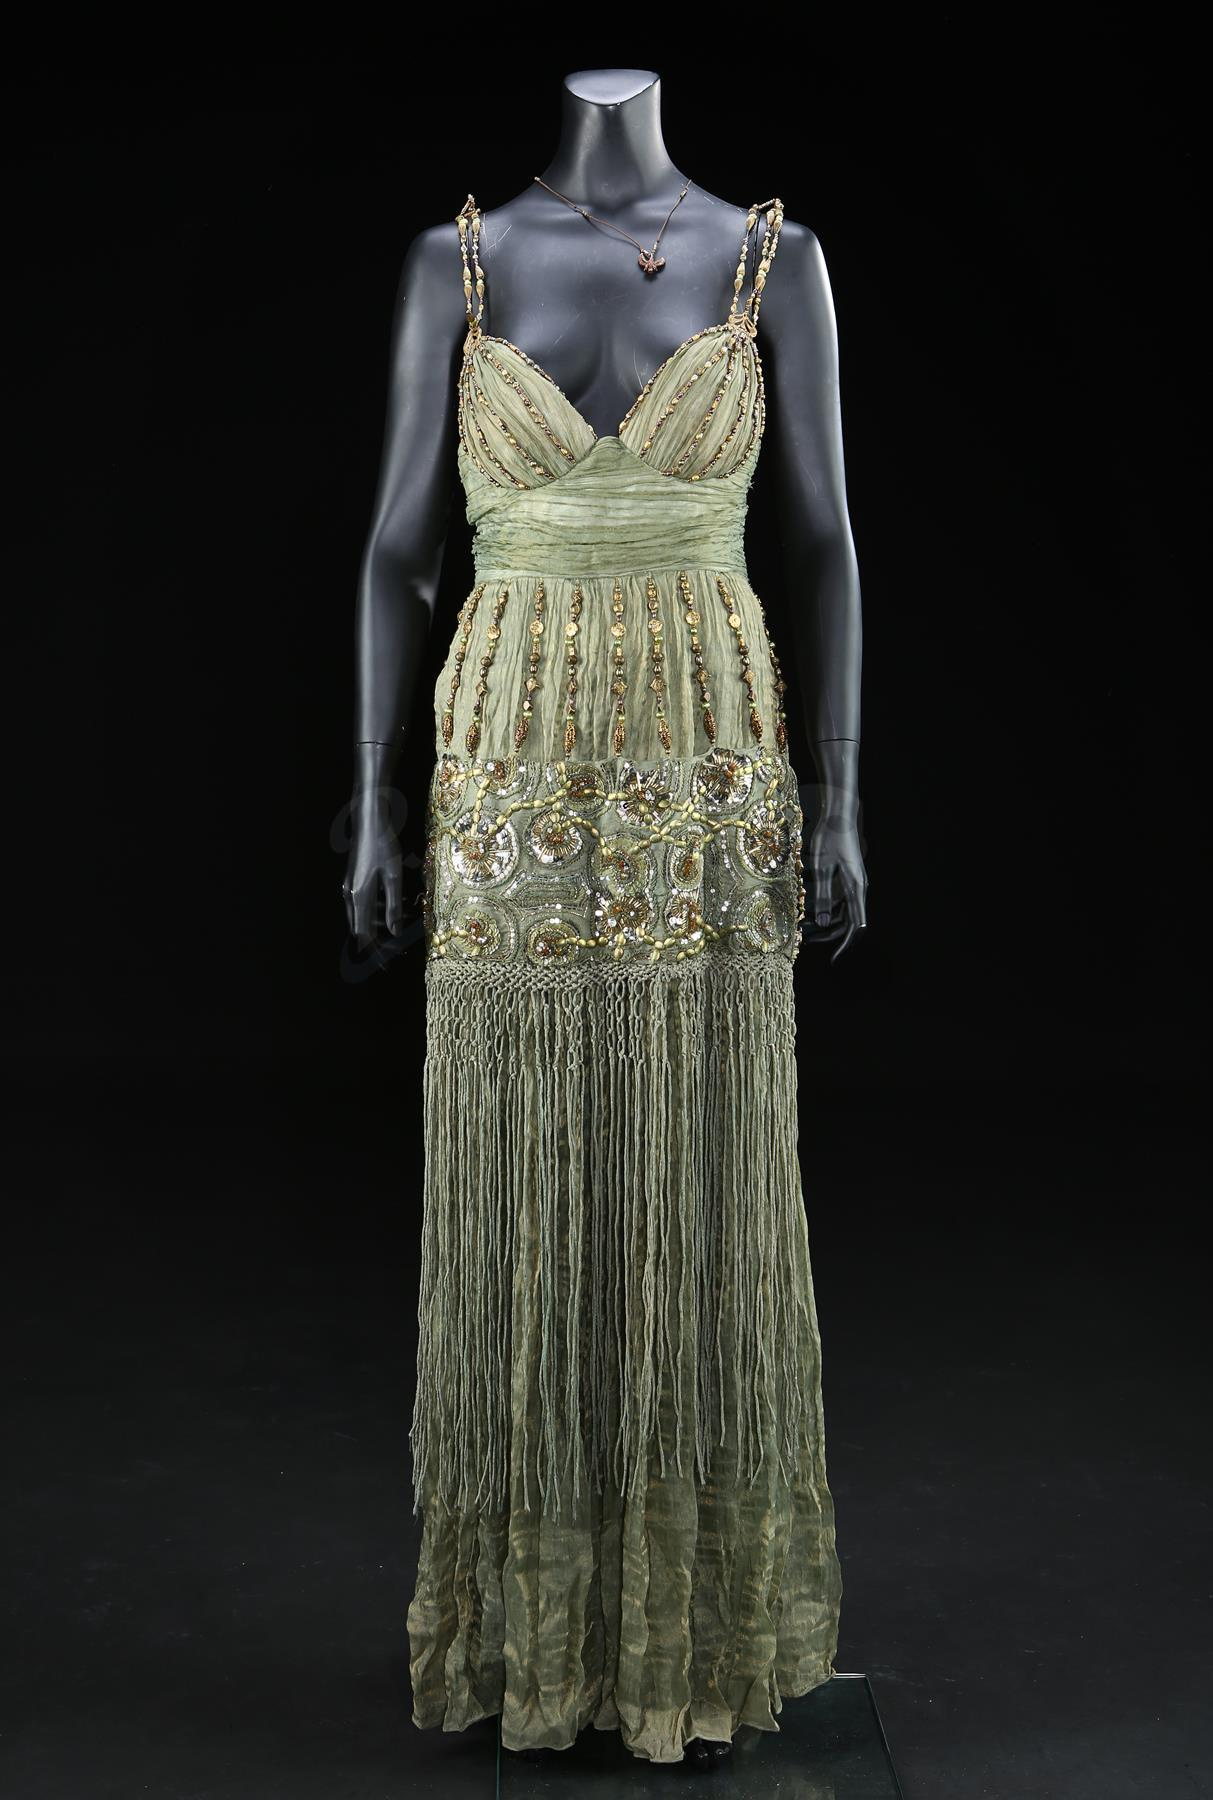 Lot # 702: GODS OF EGYPT - Zaya's Coronation Dress and Horus Necklace